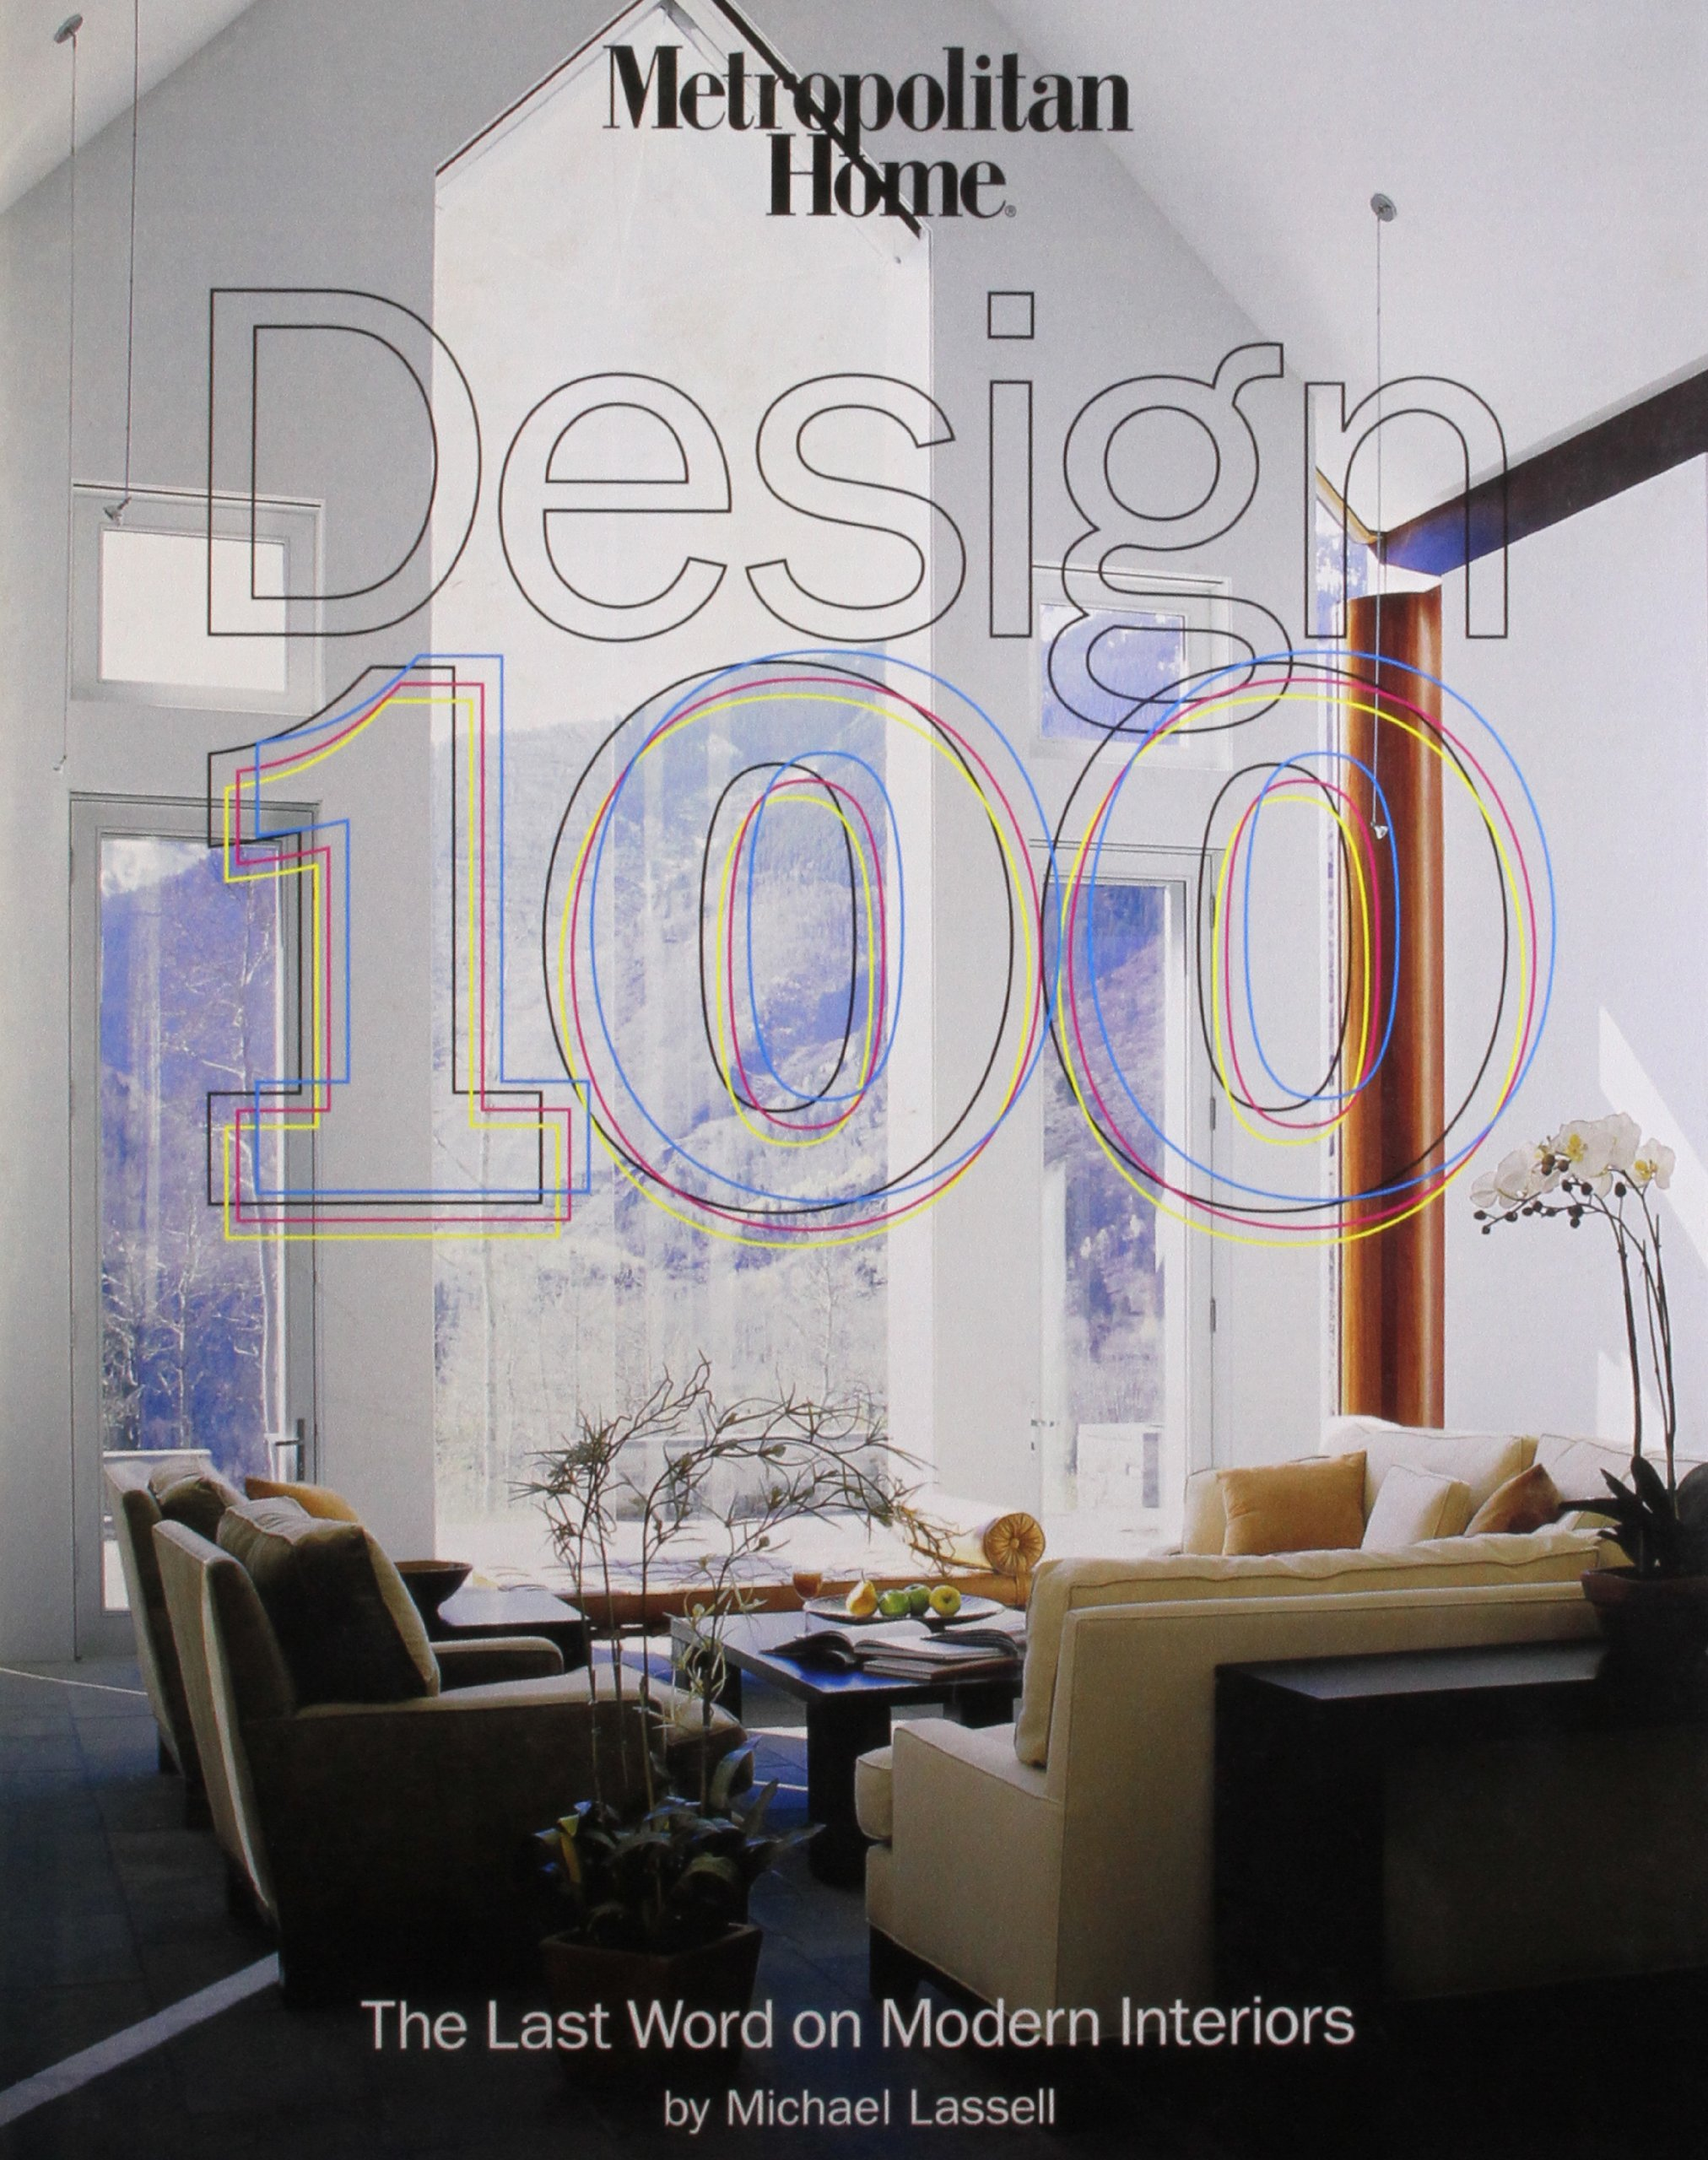 Metropolitan Home Design 100: The Last Word On Modern Interiors: Michael  Lassell, John Granen: 9781933231990: Amazon.com: Books